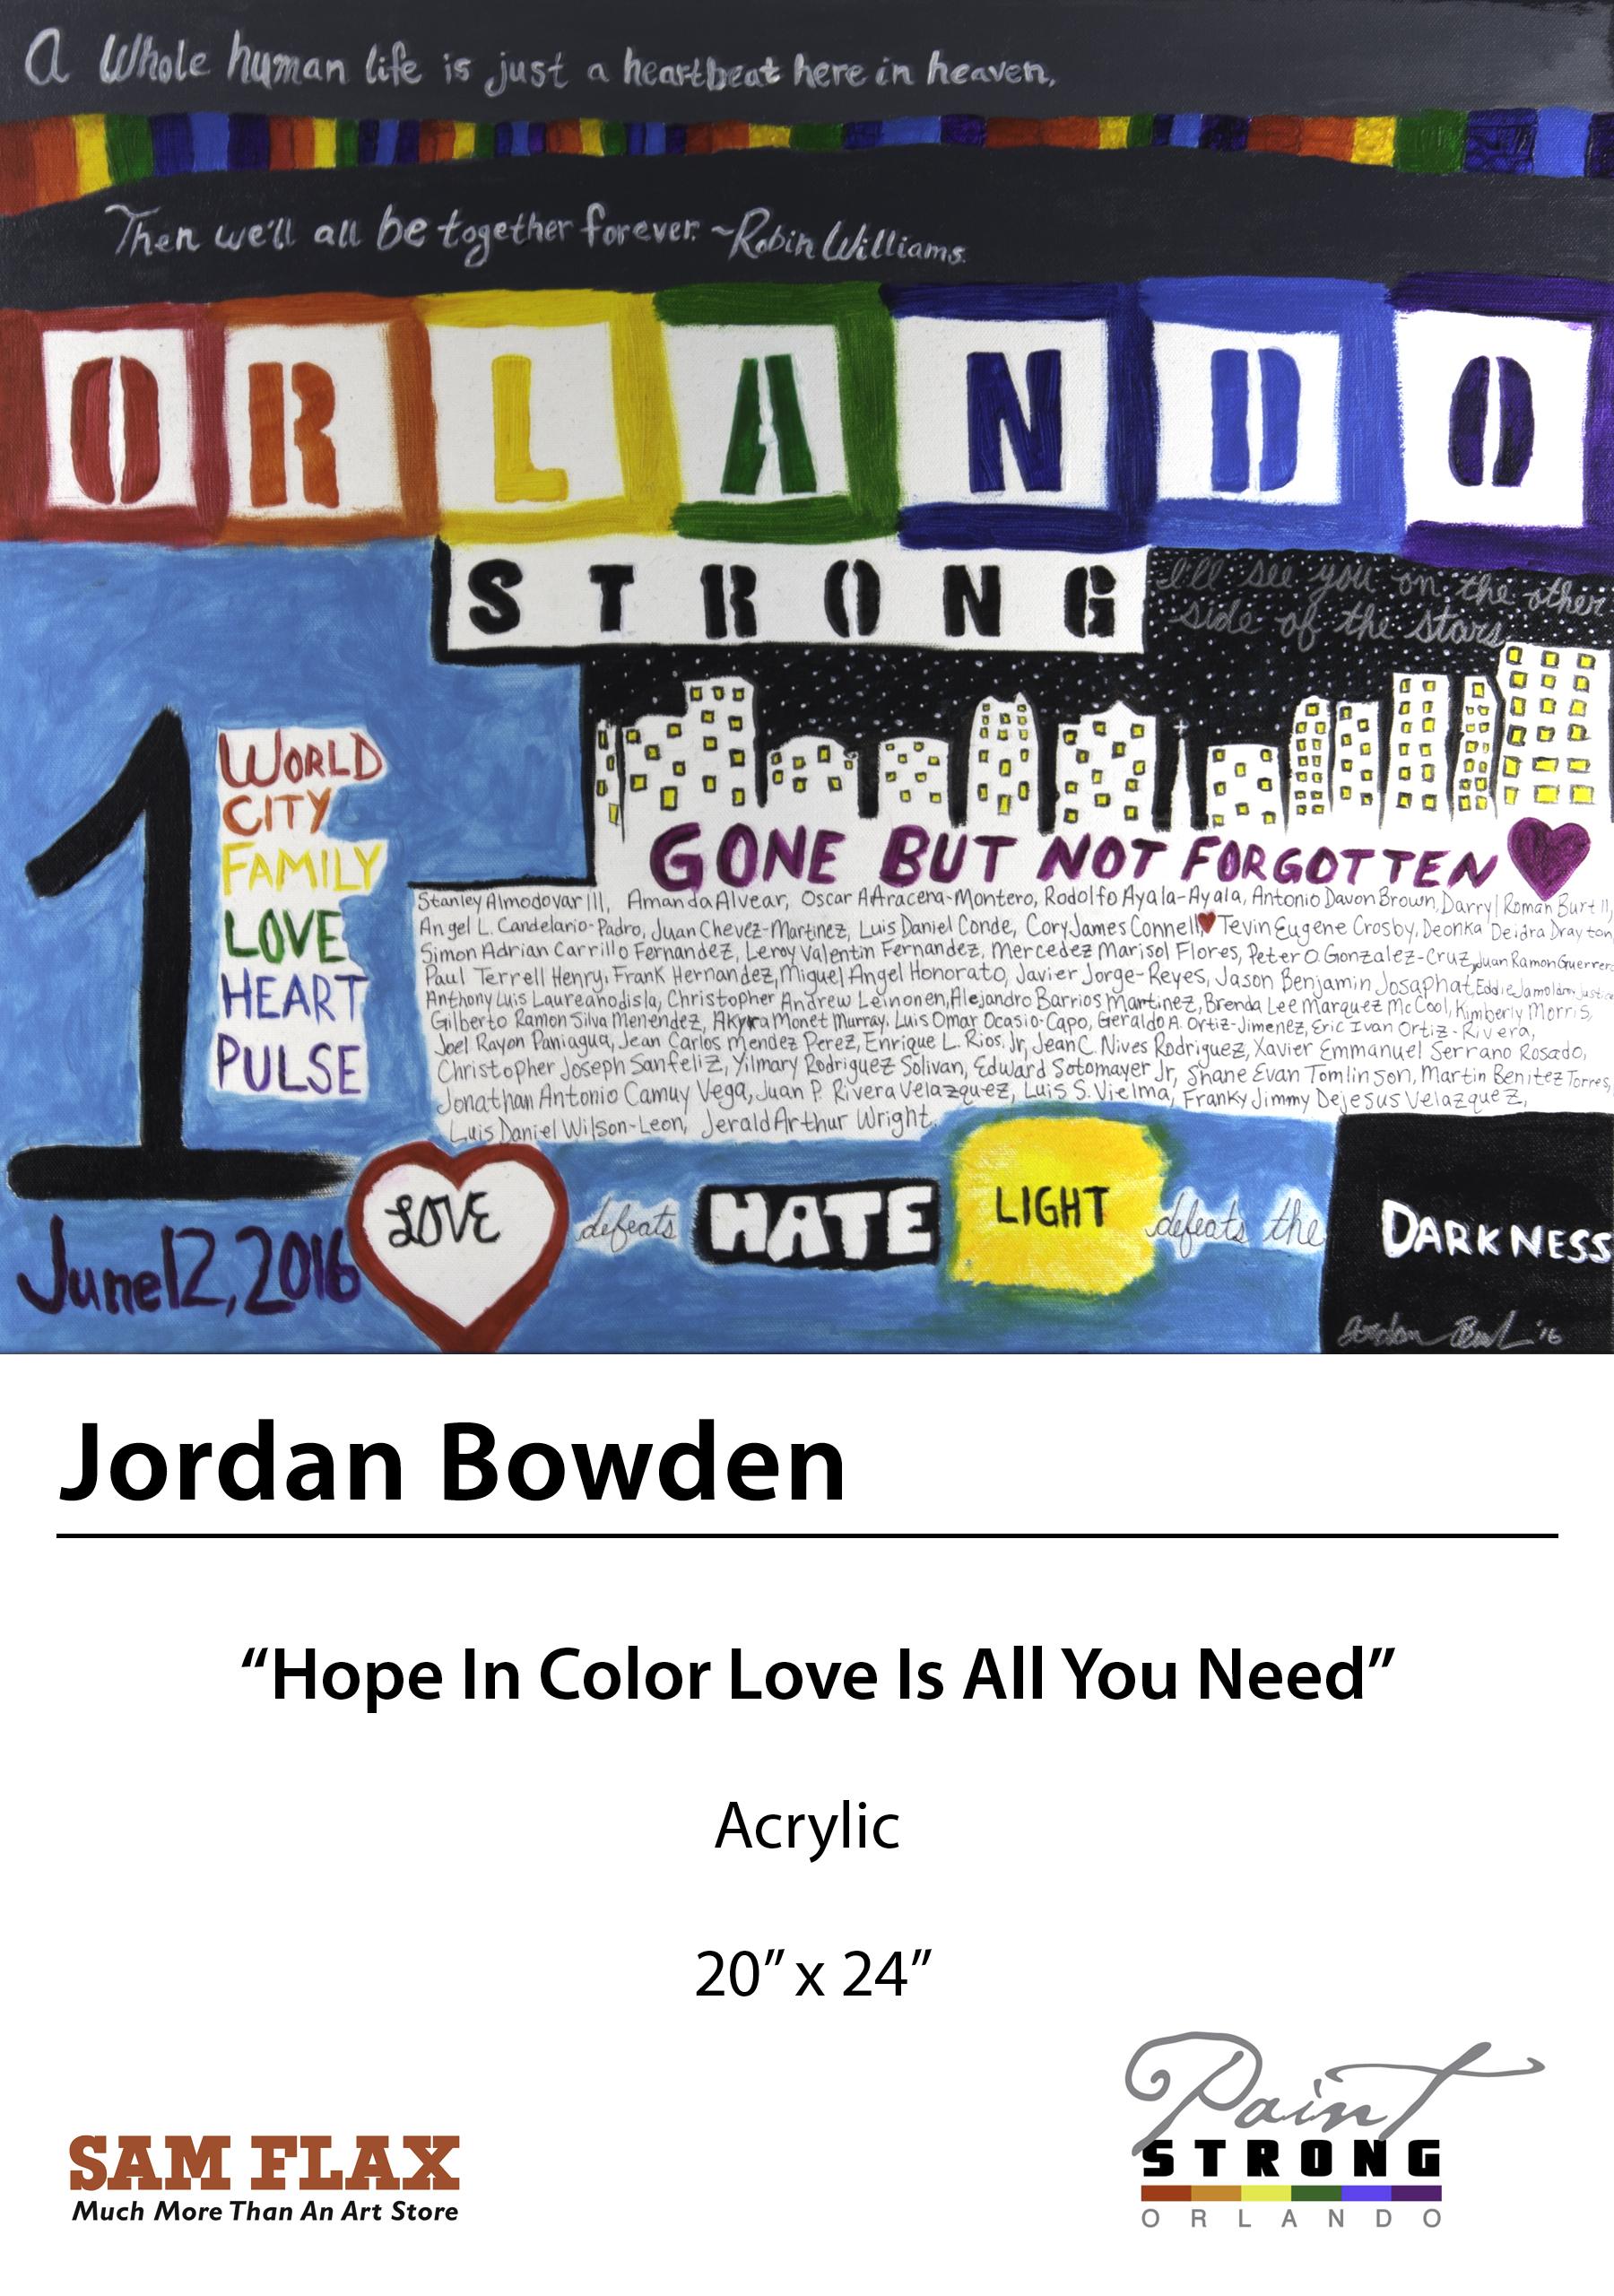 Jordan Bowden